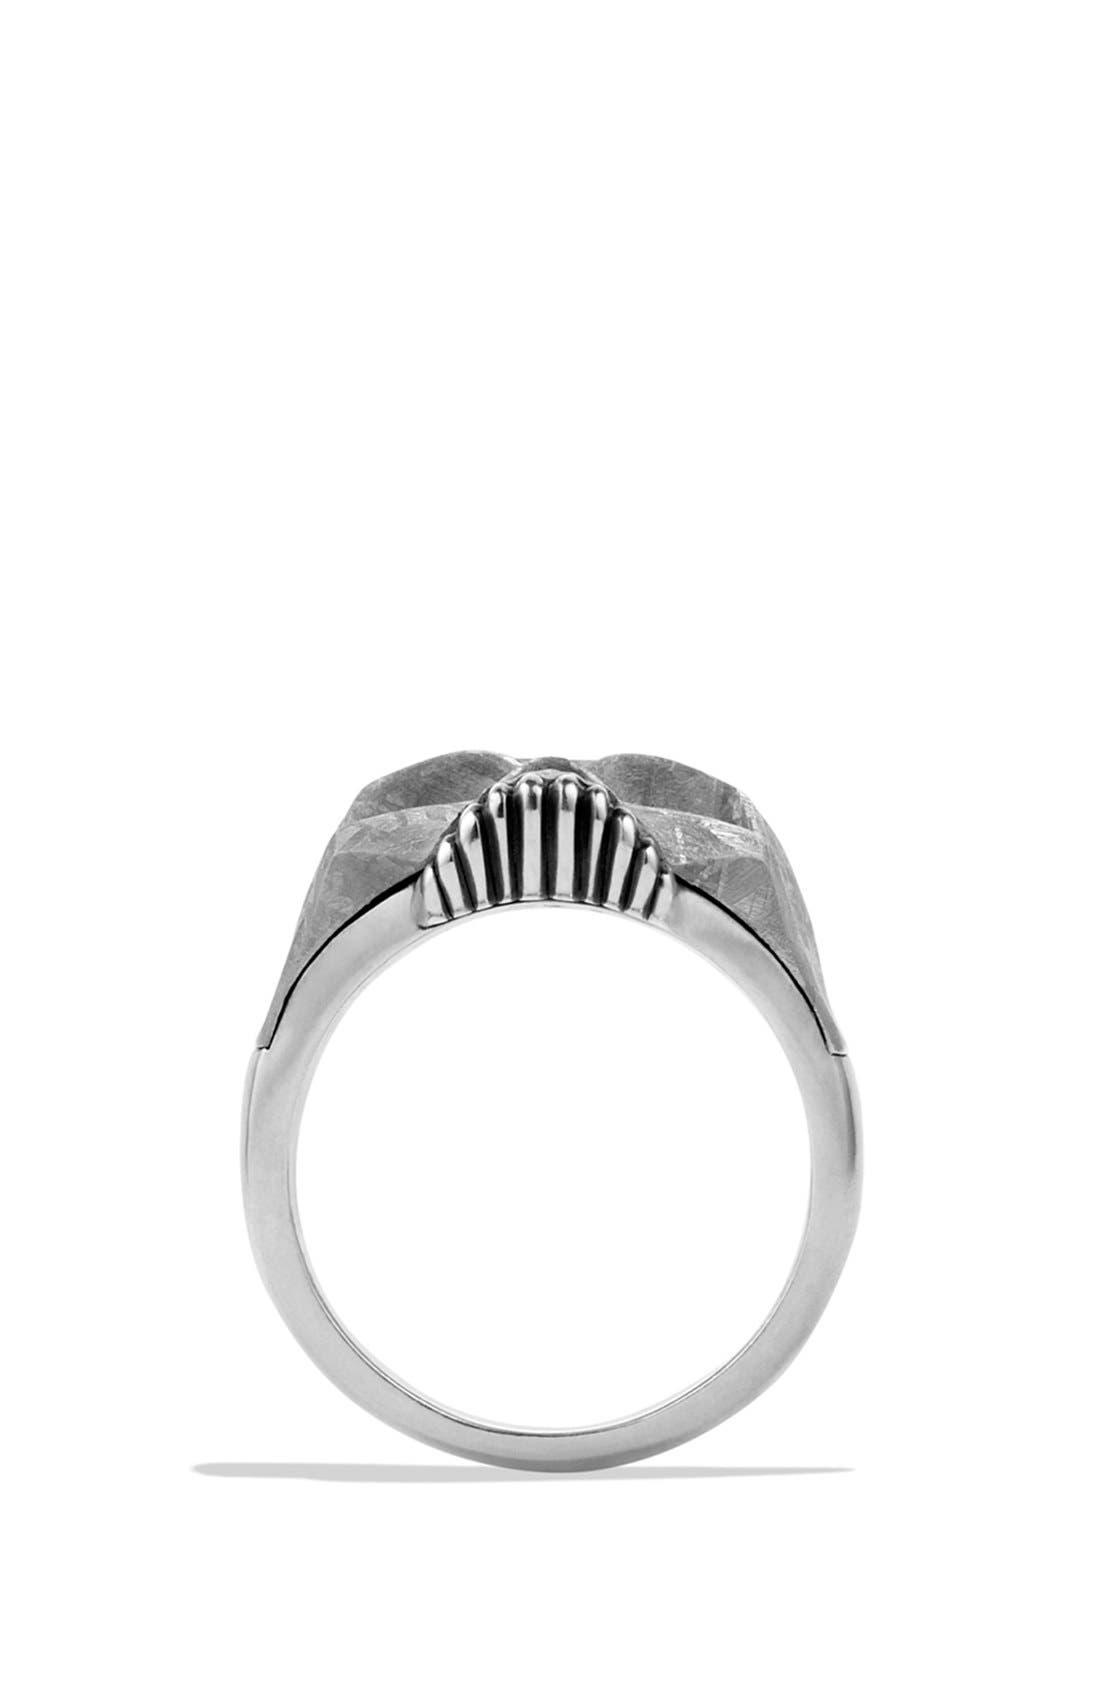 Alternate Image 4  - David Yurman 'Skull' Ring with Carved Meteorite